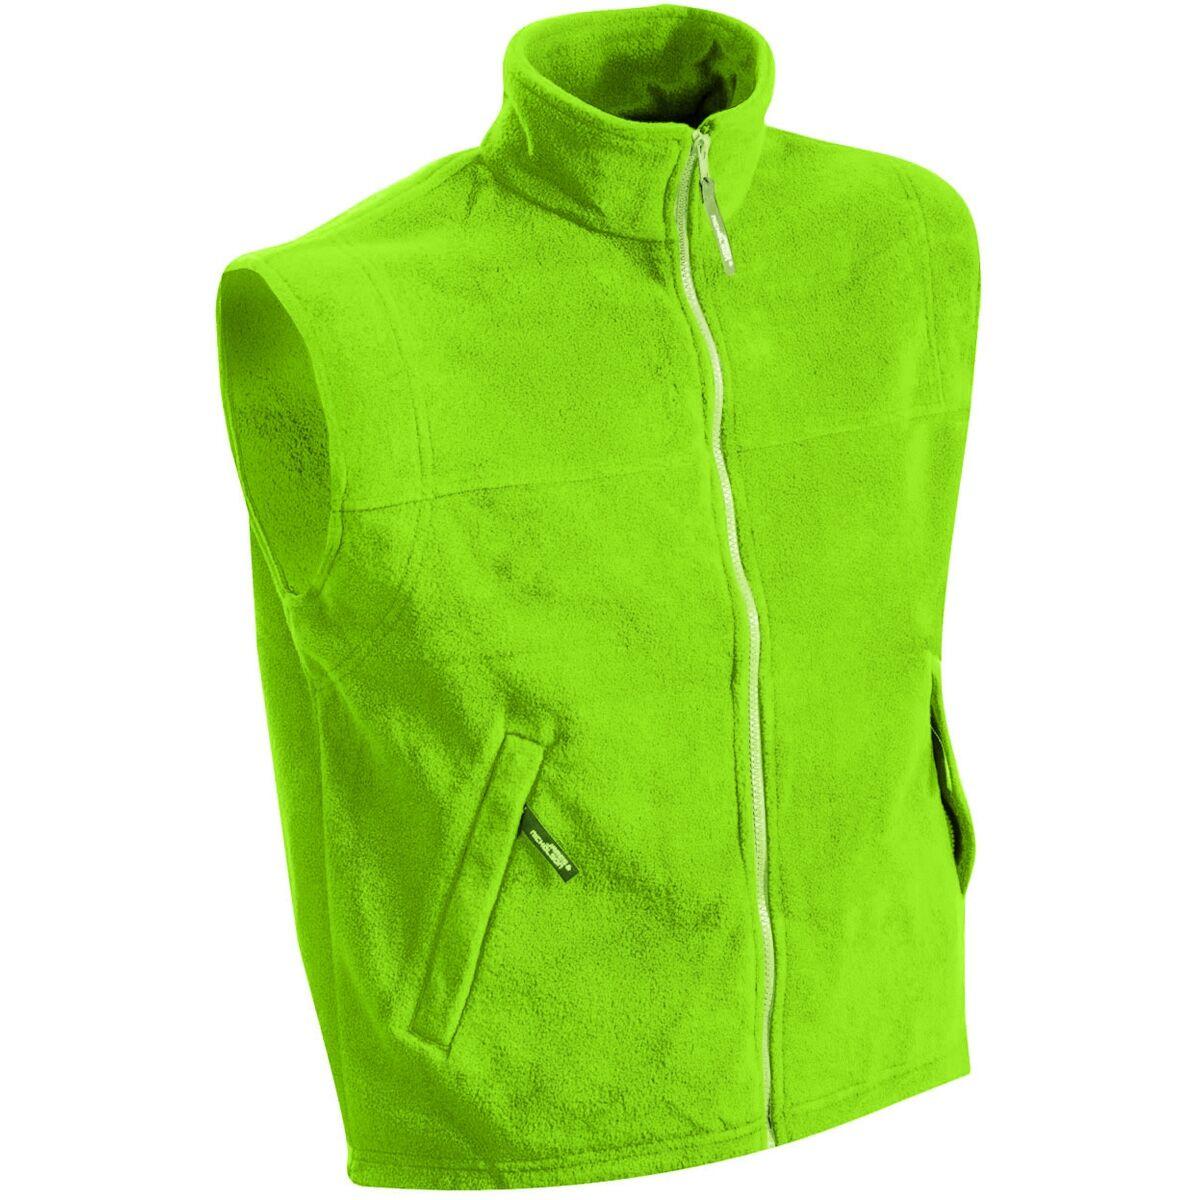 Gilet sans manches bodywarmer polaire homme - JN045 - vert citron